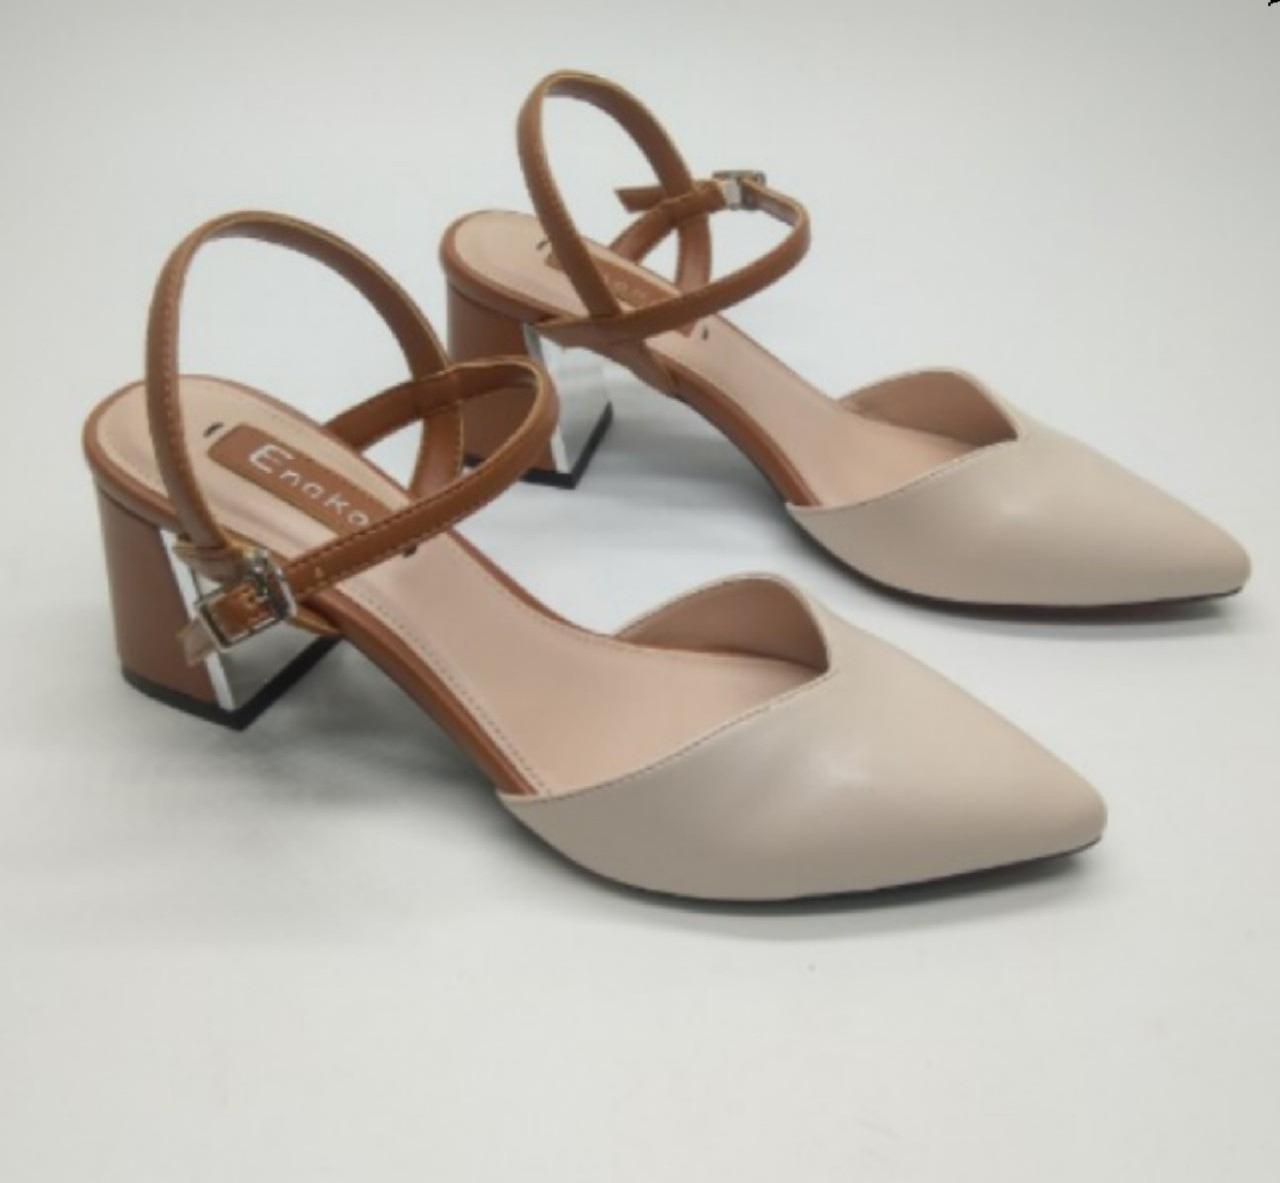 Giày sandals nữ cao gót. dép nữ cao gót  MH13283 màu kem